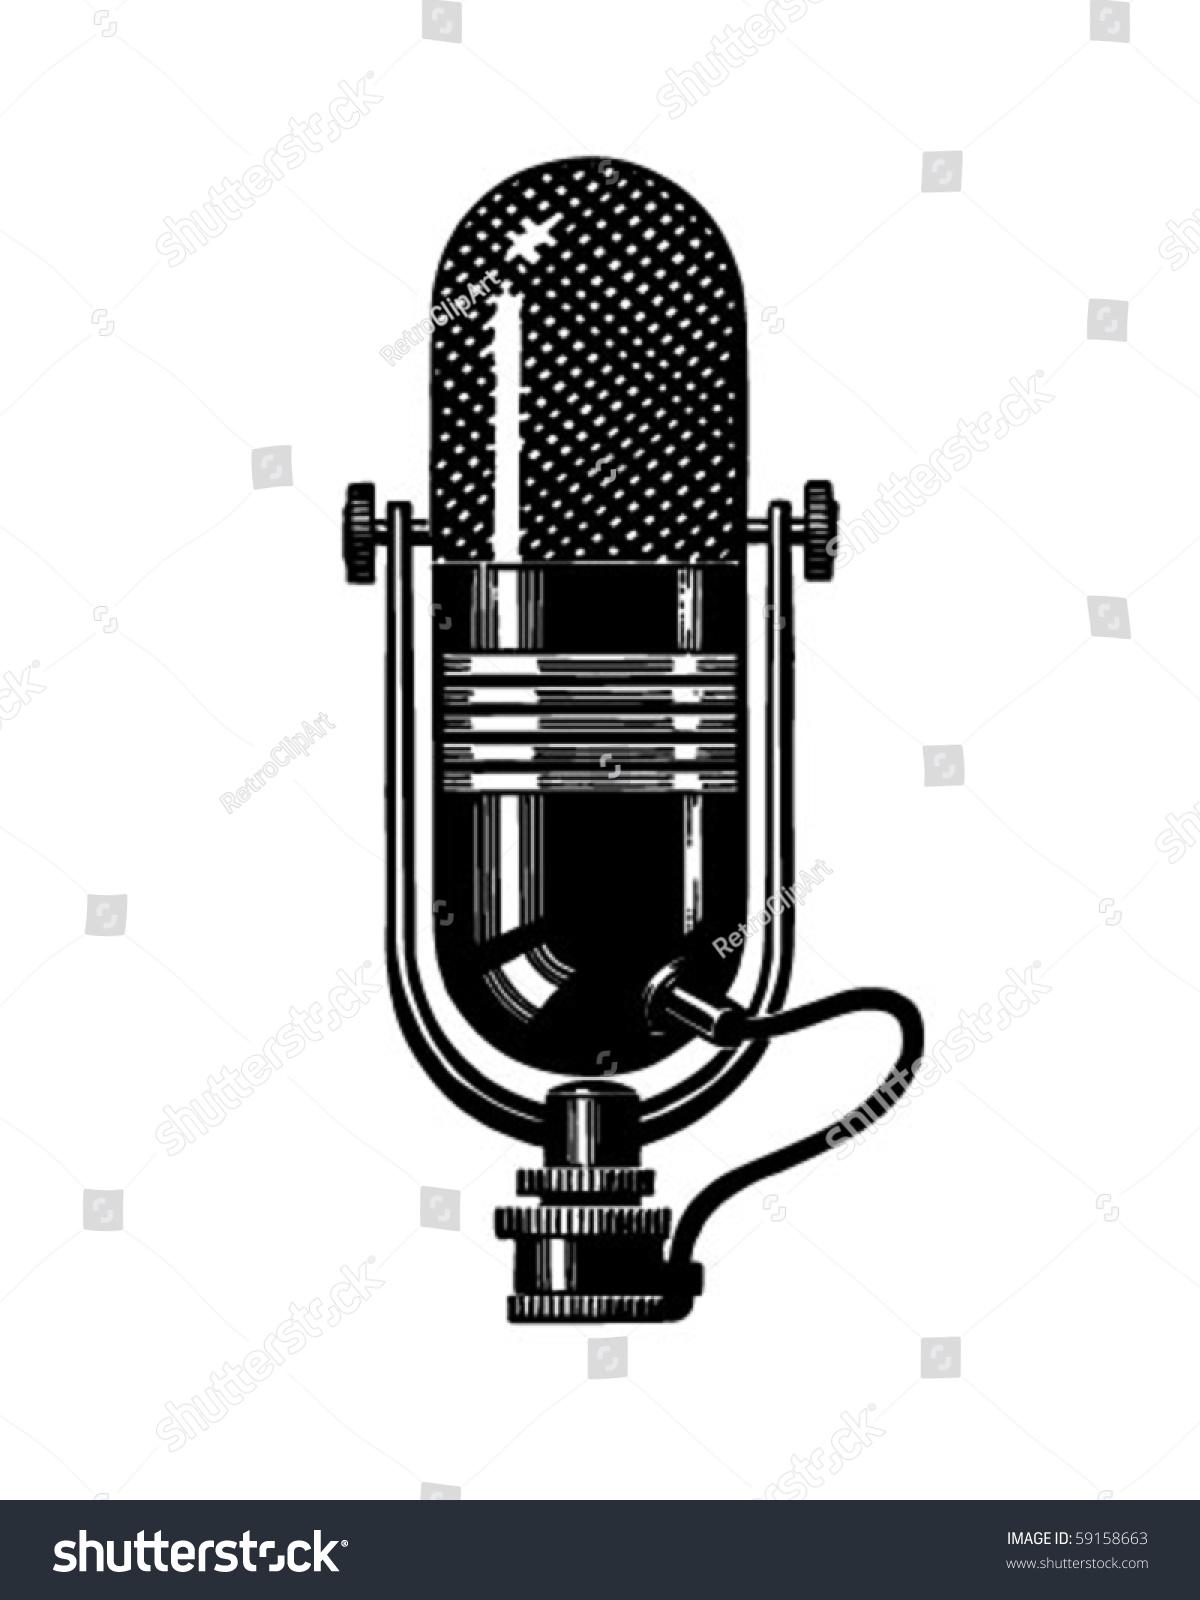 Microphone 2 - Retro Clip Art Stock Vector Illustration ...